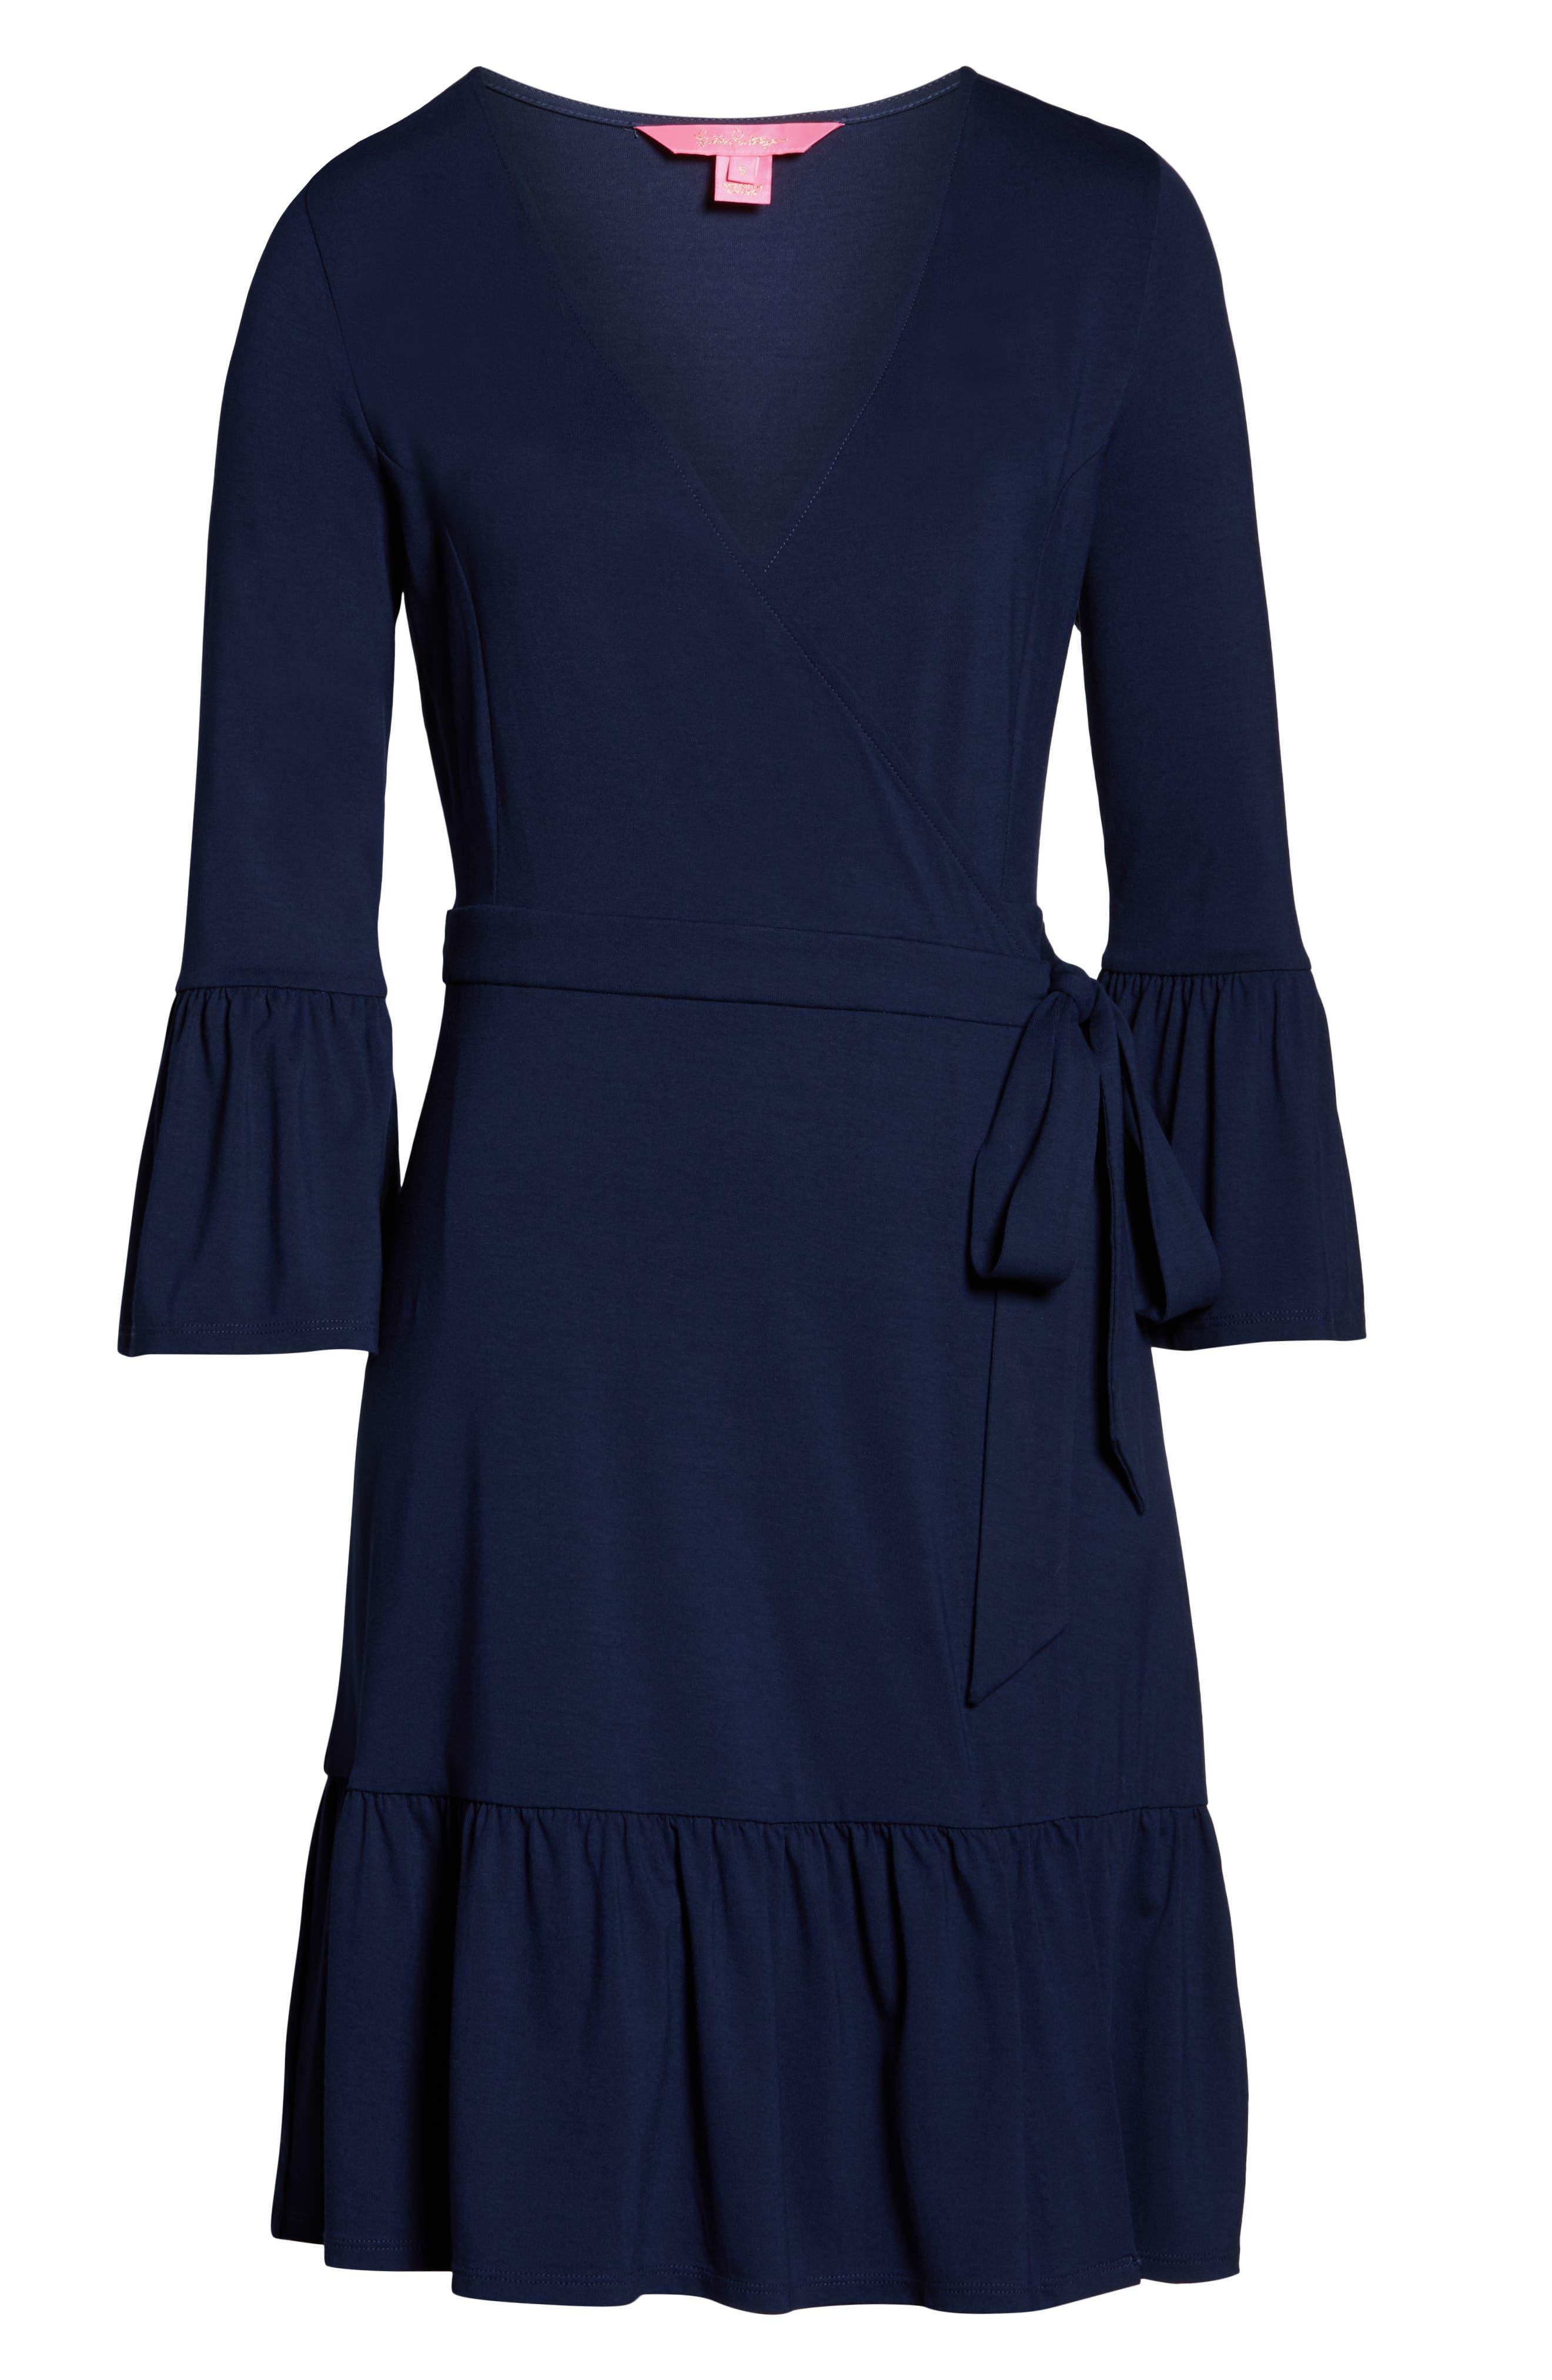 LILLY PULITZER<SUP>®</SUP>, Misha Wrap Dress, Alternate thumbnail 6, color, TRUE NAVY